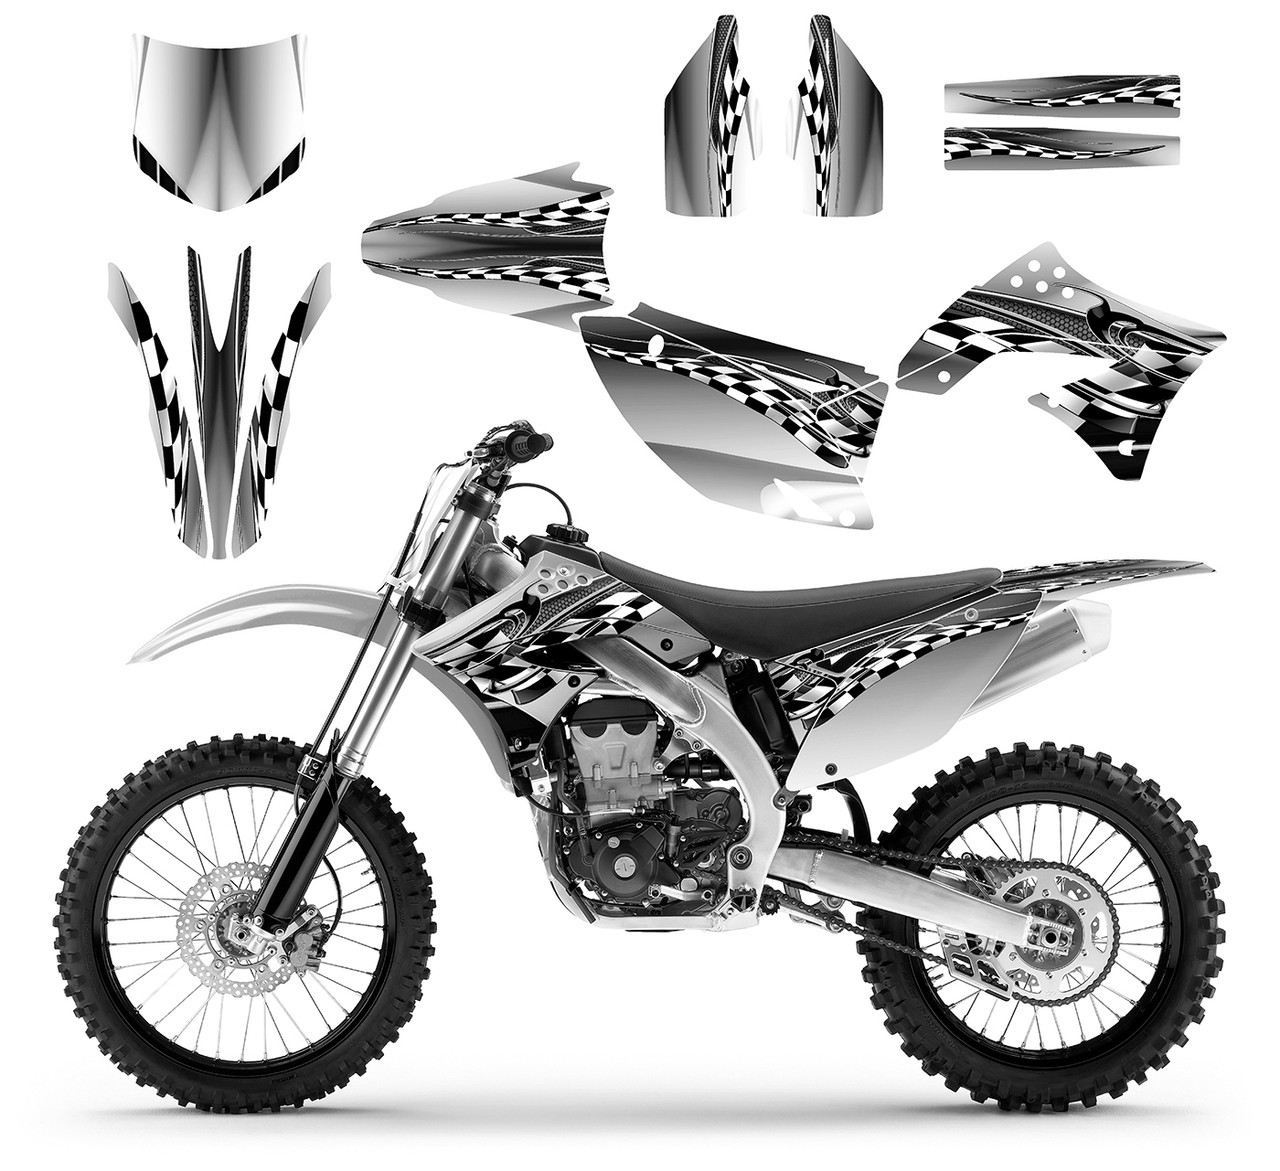 2011 kx 450f graphics kit with free custom service